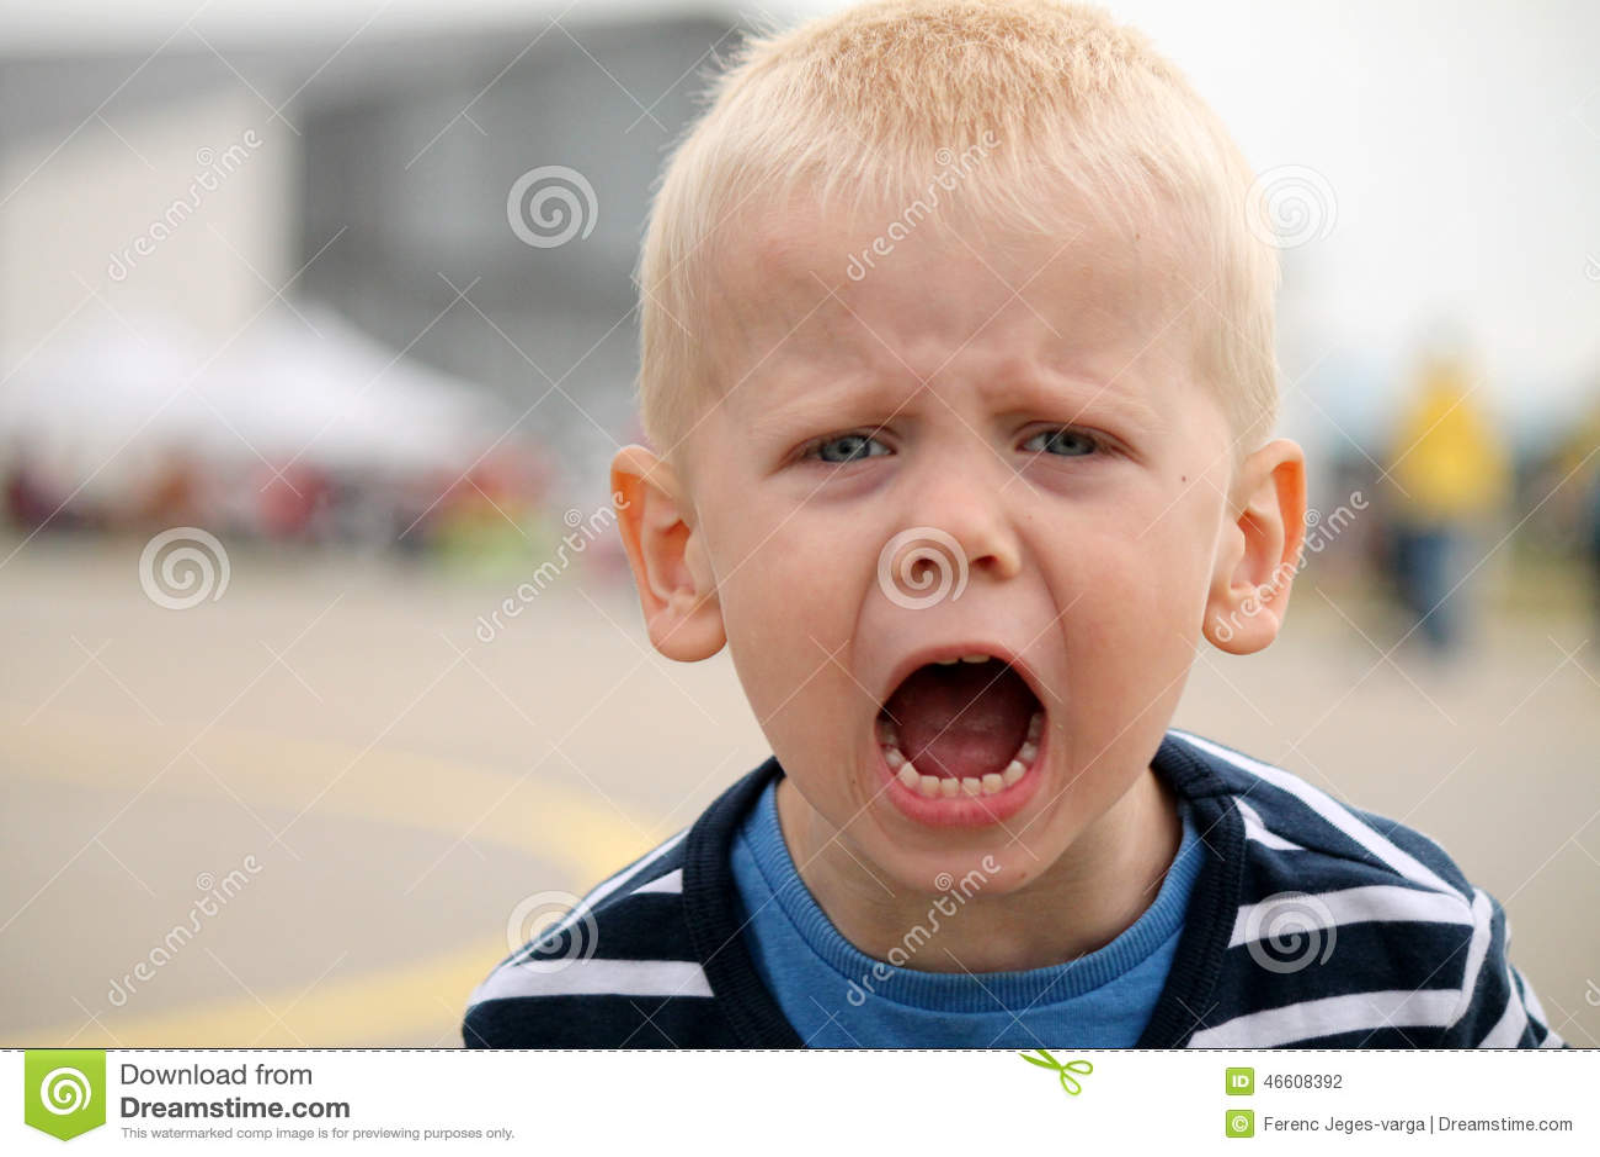 Boy is shouting